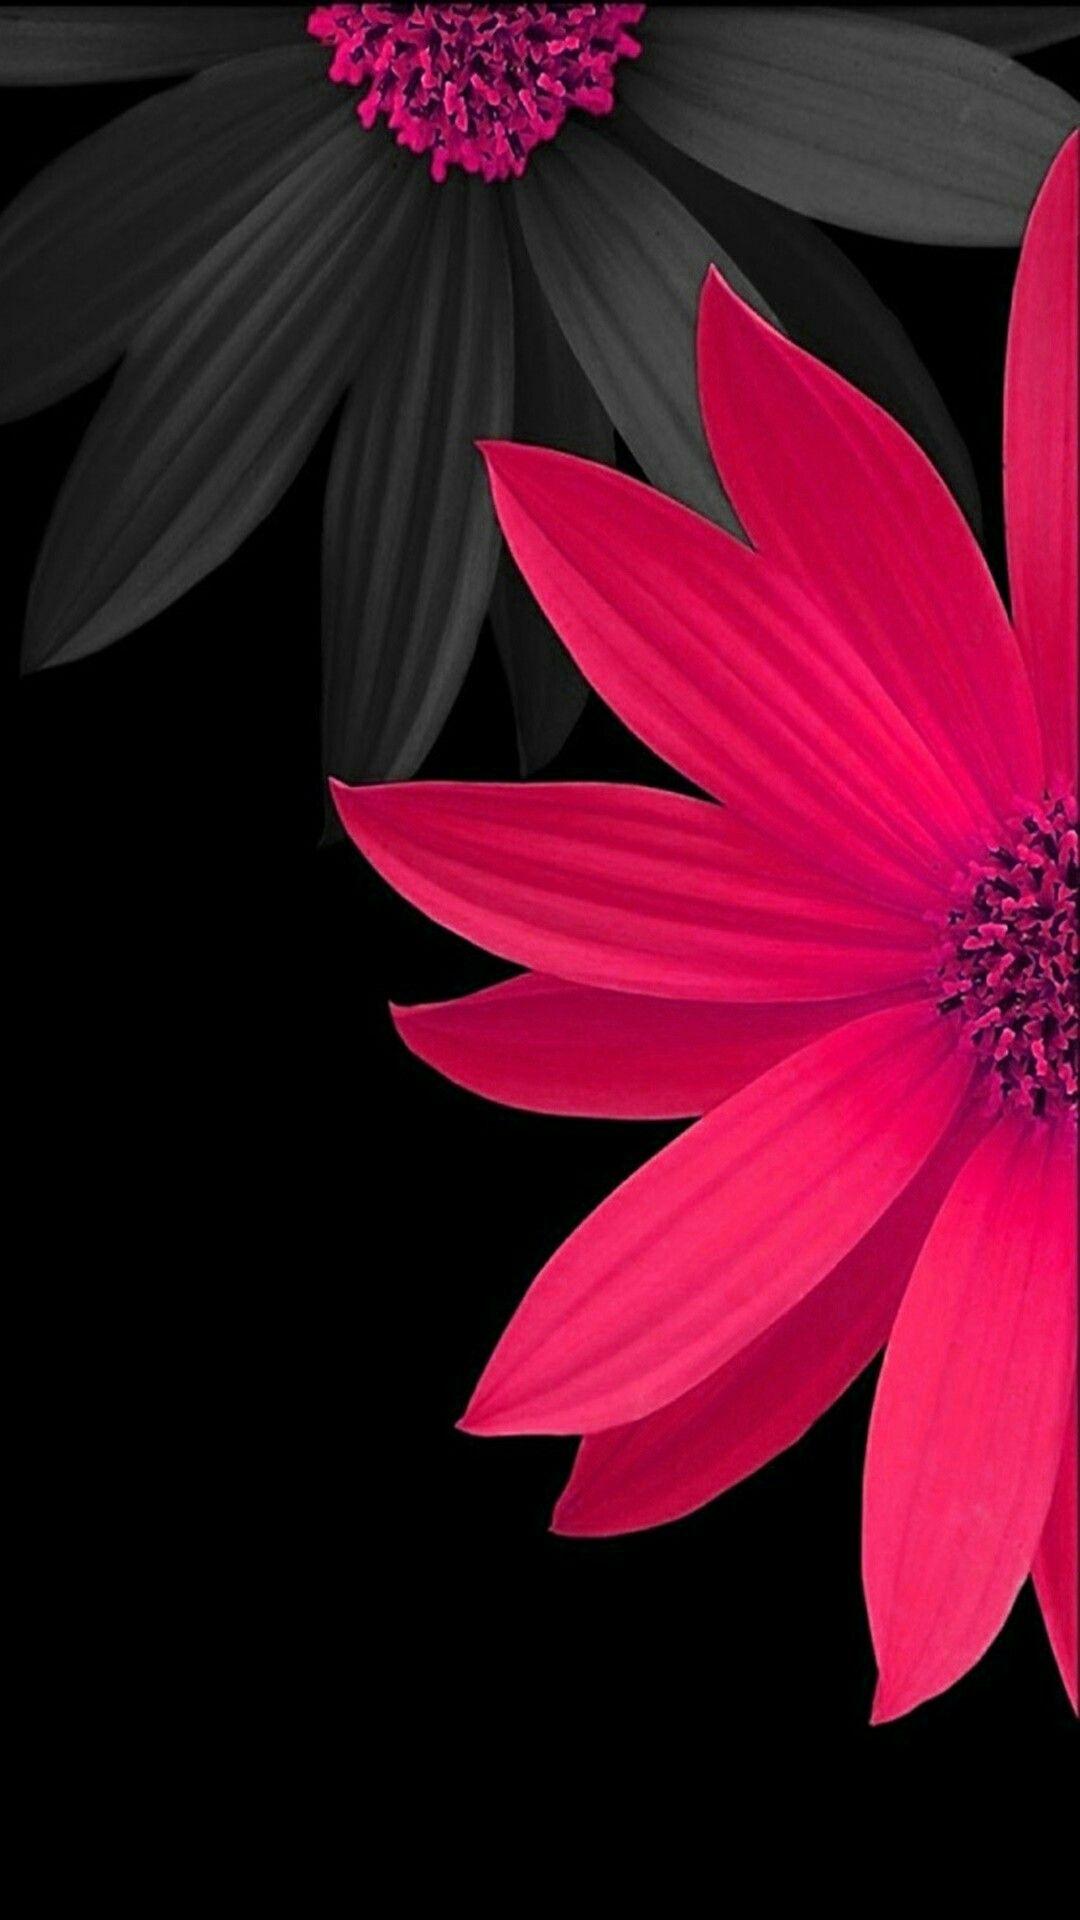 Neon Wallpaper Nature Colorful Black Iphone Backgrounds Desktop Wallpapers Flower Artwork